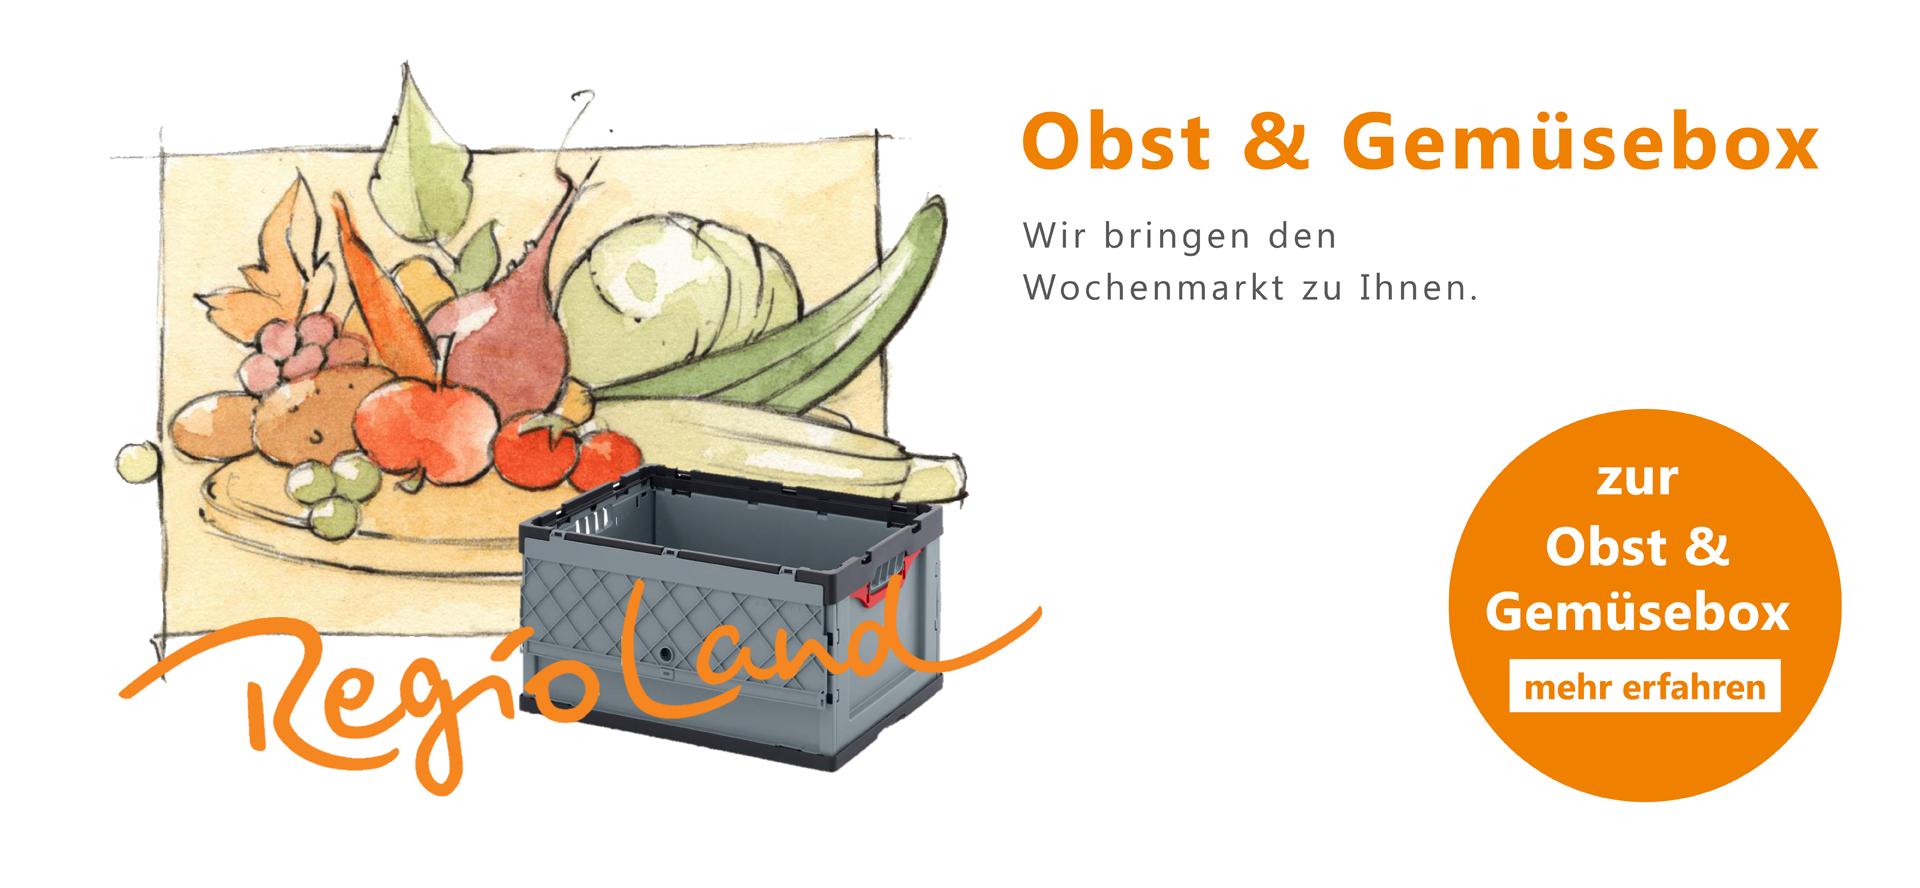 Obst & Gemüsebox